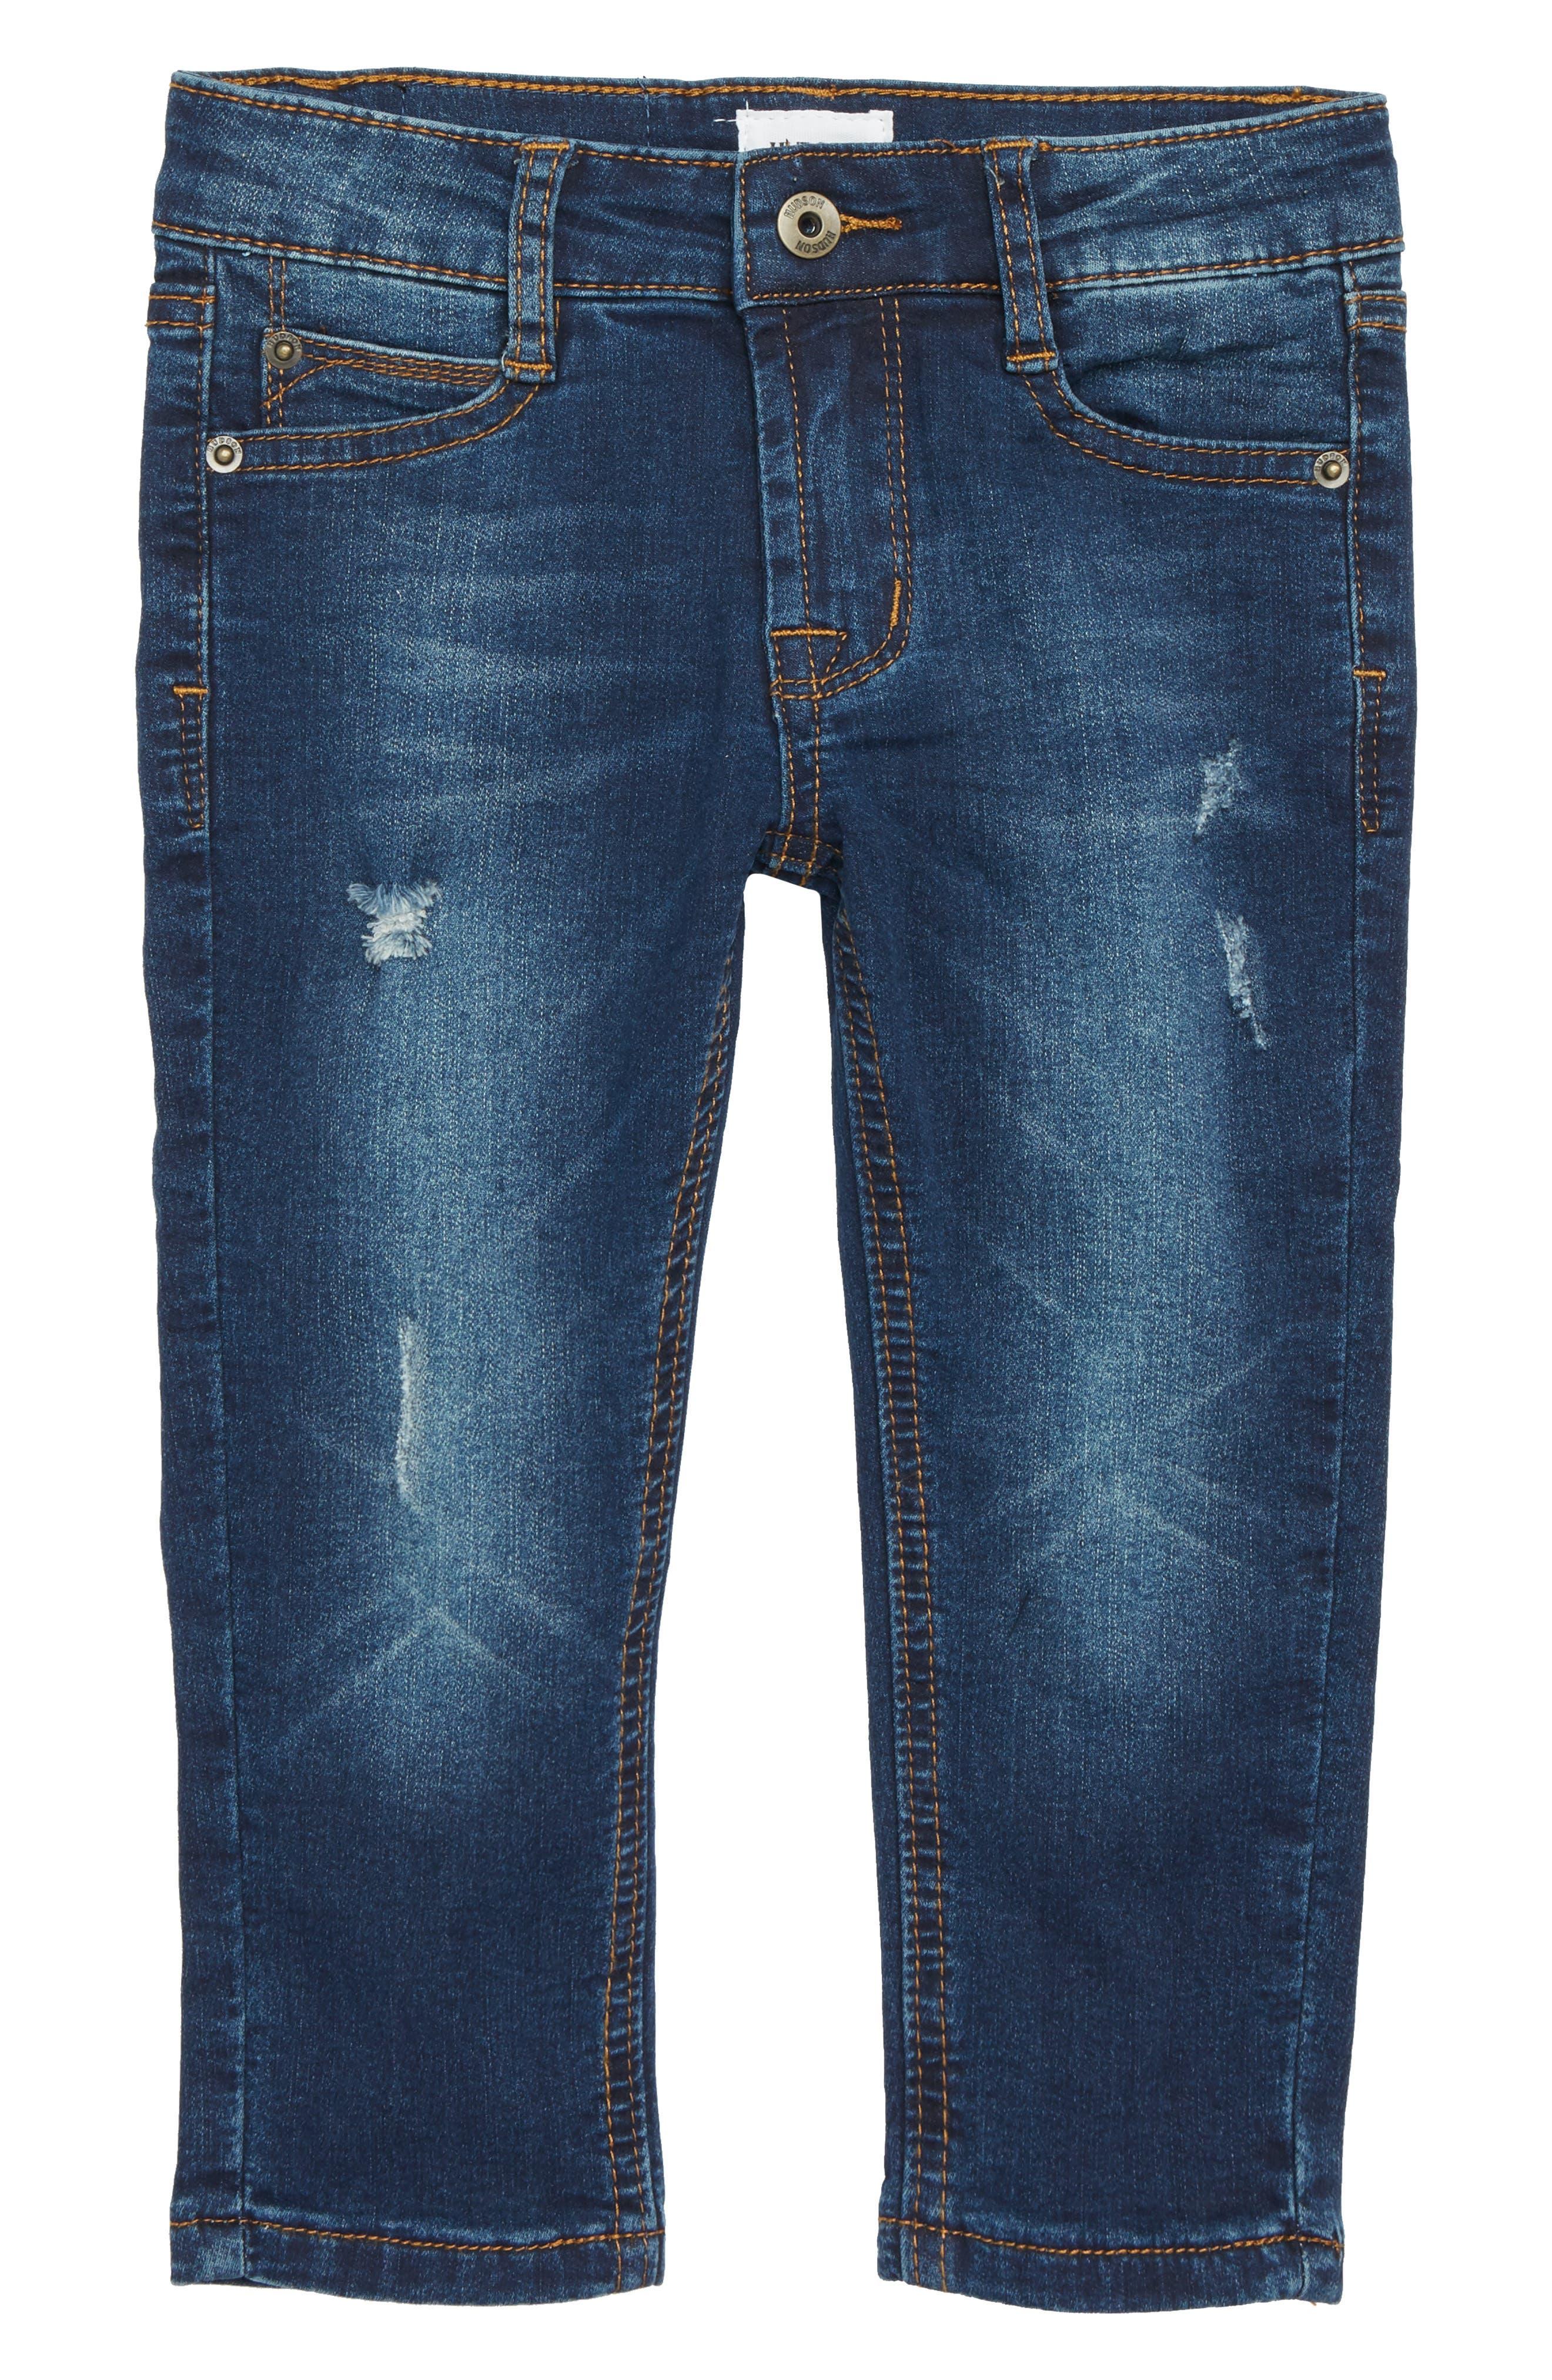 Jude Slim Fit Skinny Jeans,                         Main,                         color, 481